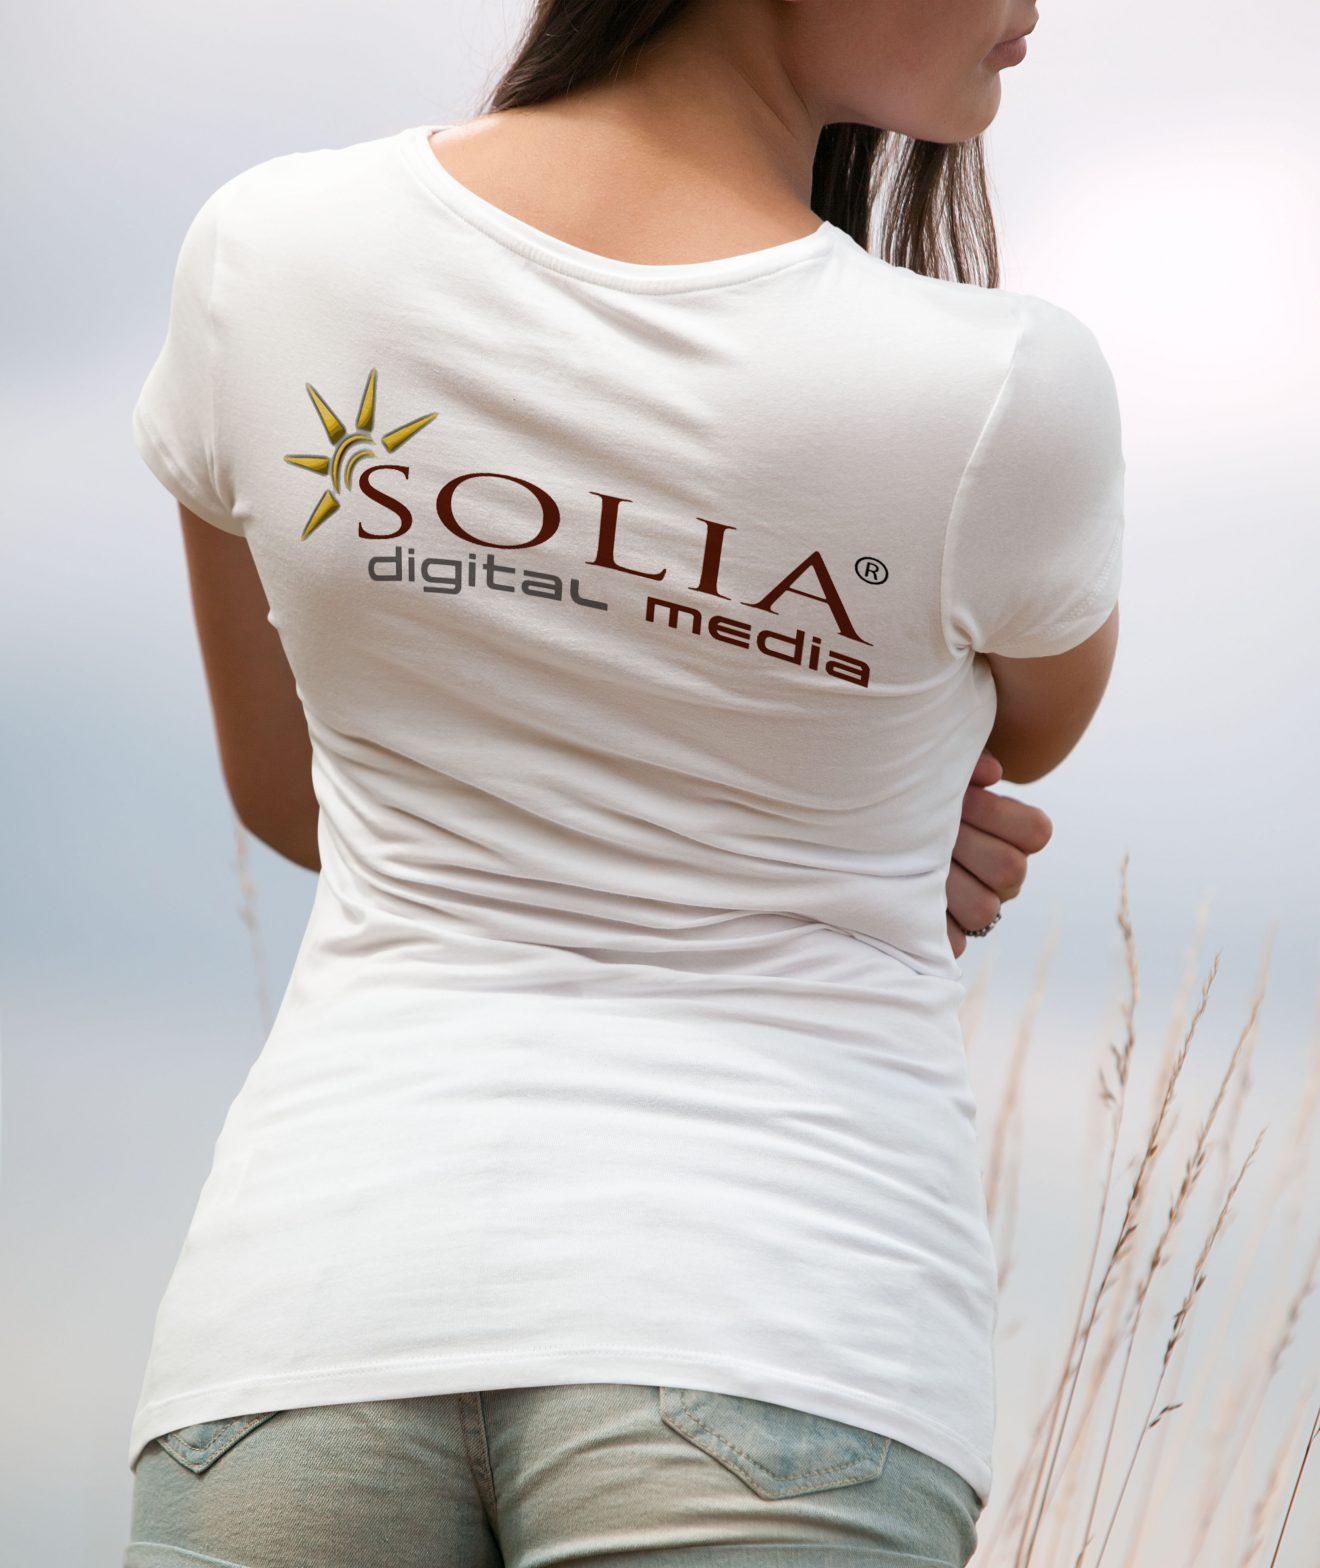 04.-Solia-Posting Final